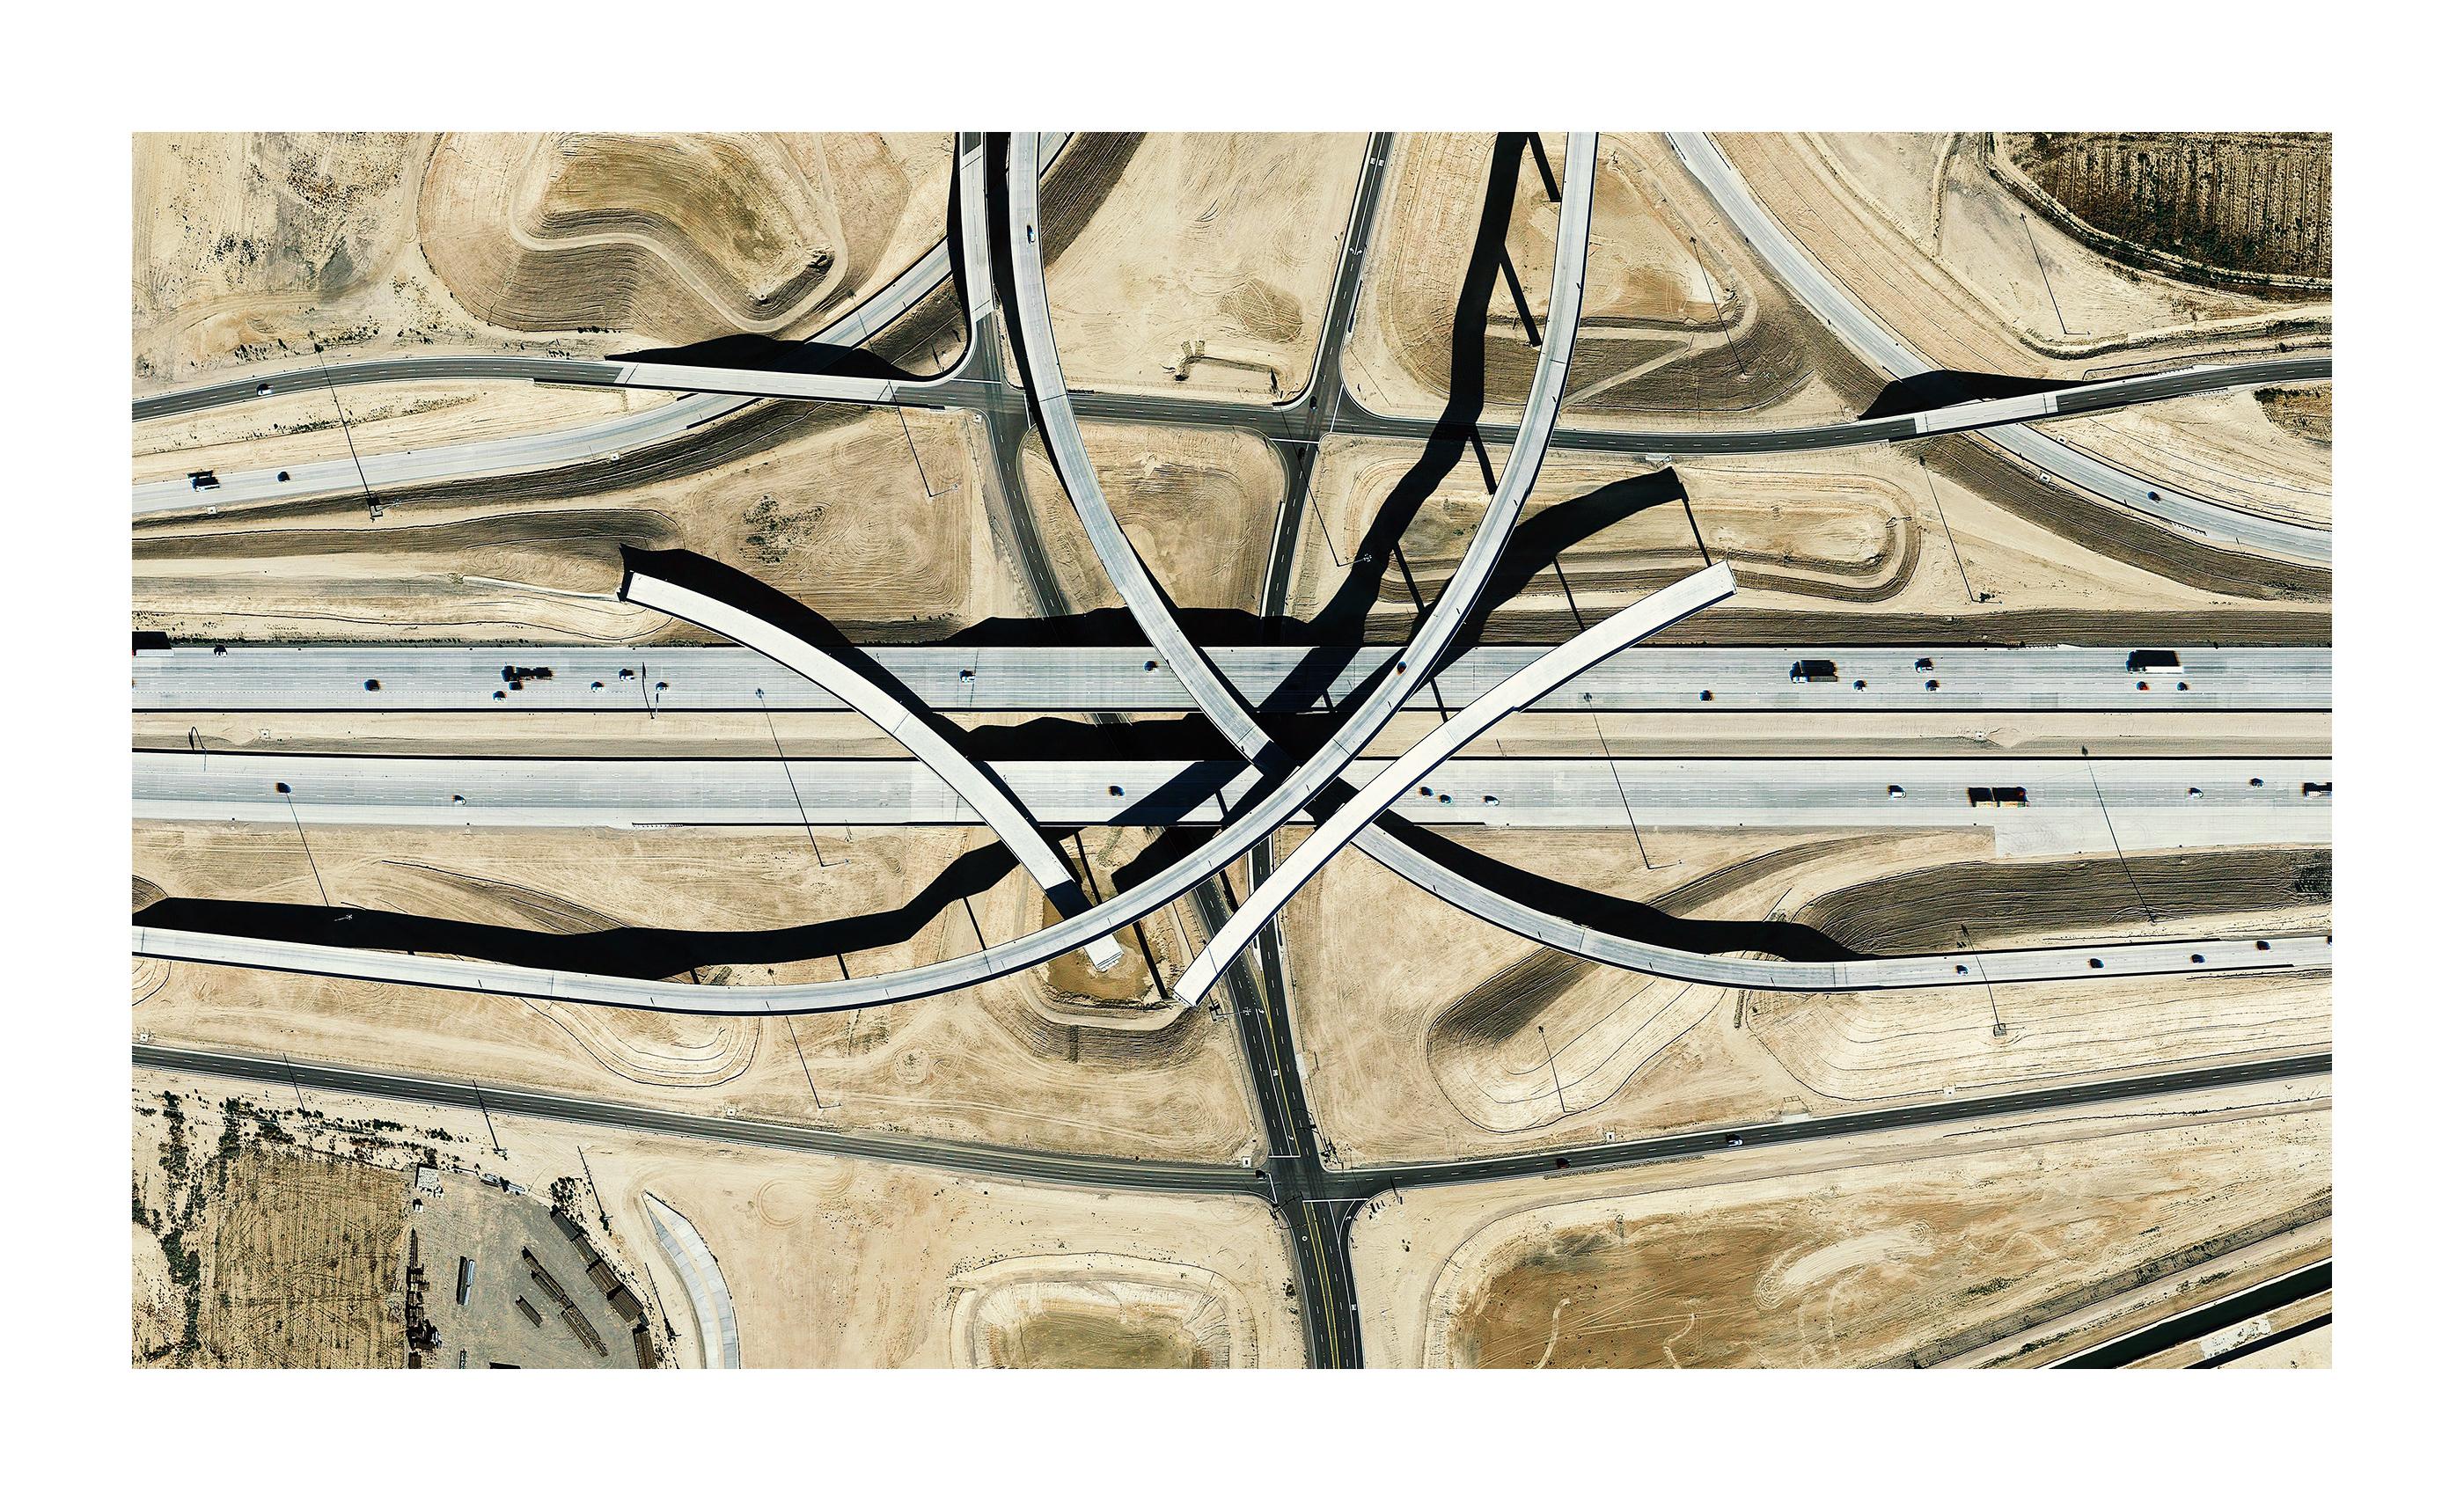 Infrastructure Patterns IV